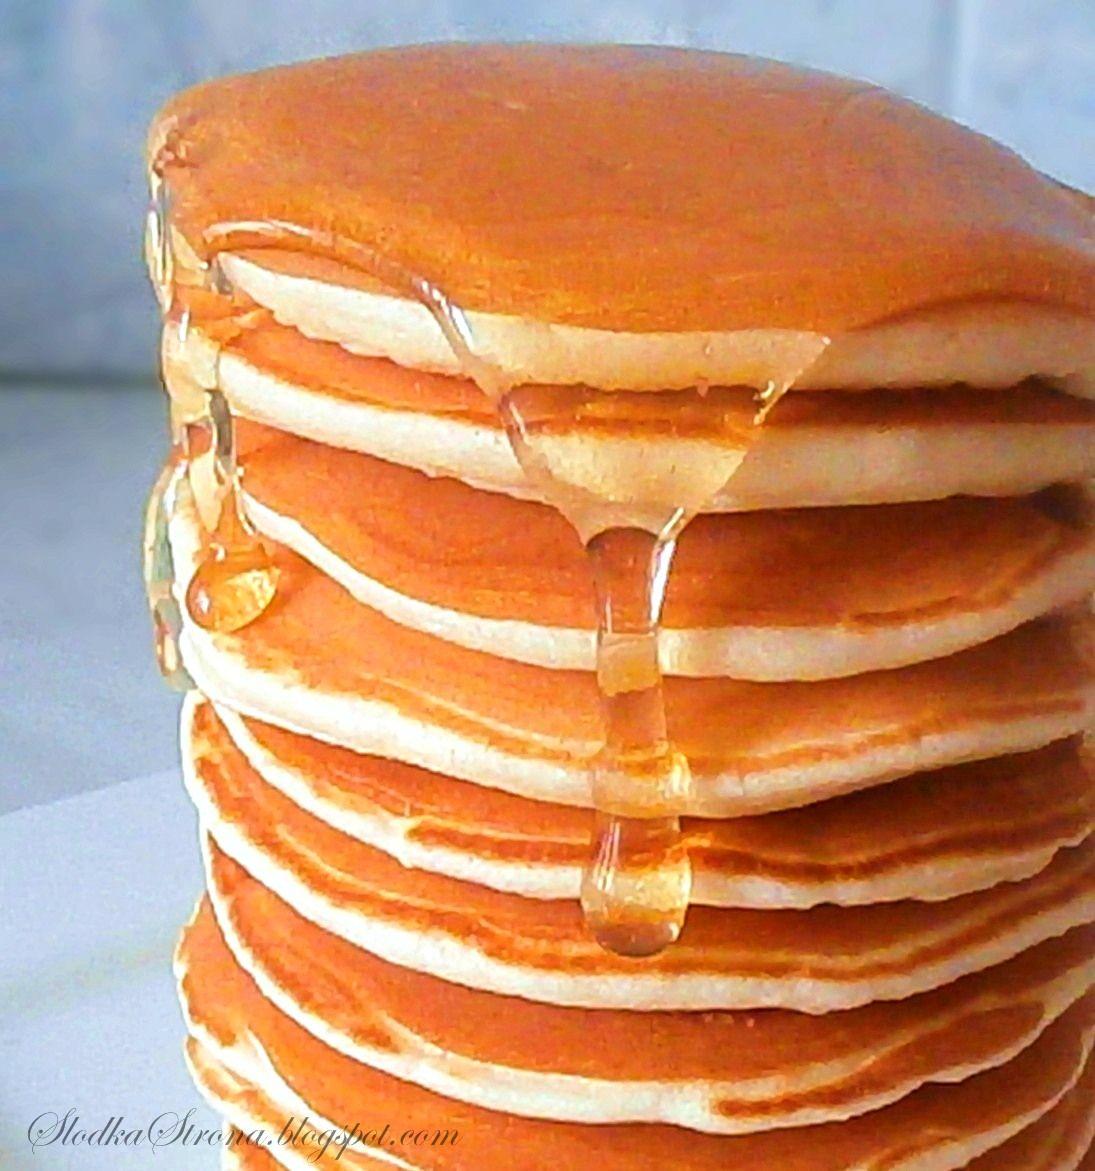 Slodka Strona Oryginalne Amerykanskie Pancakes Y Culinary Recipes Yummy Pancake Recipe Food Garnishes